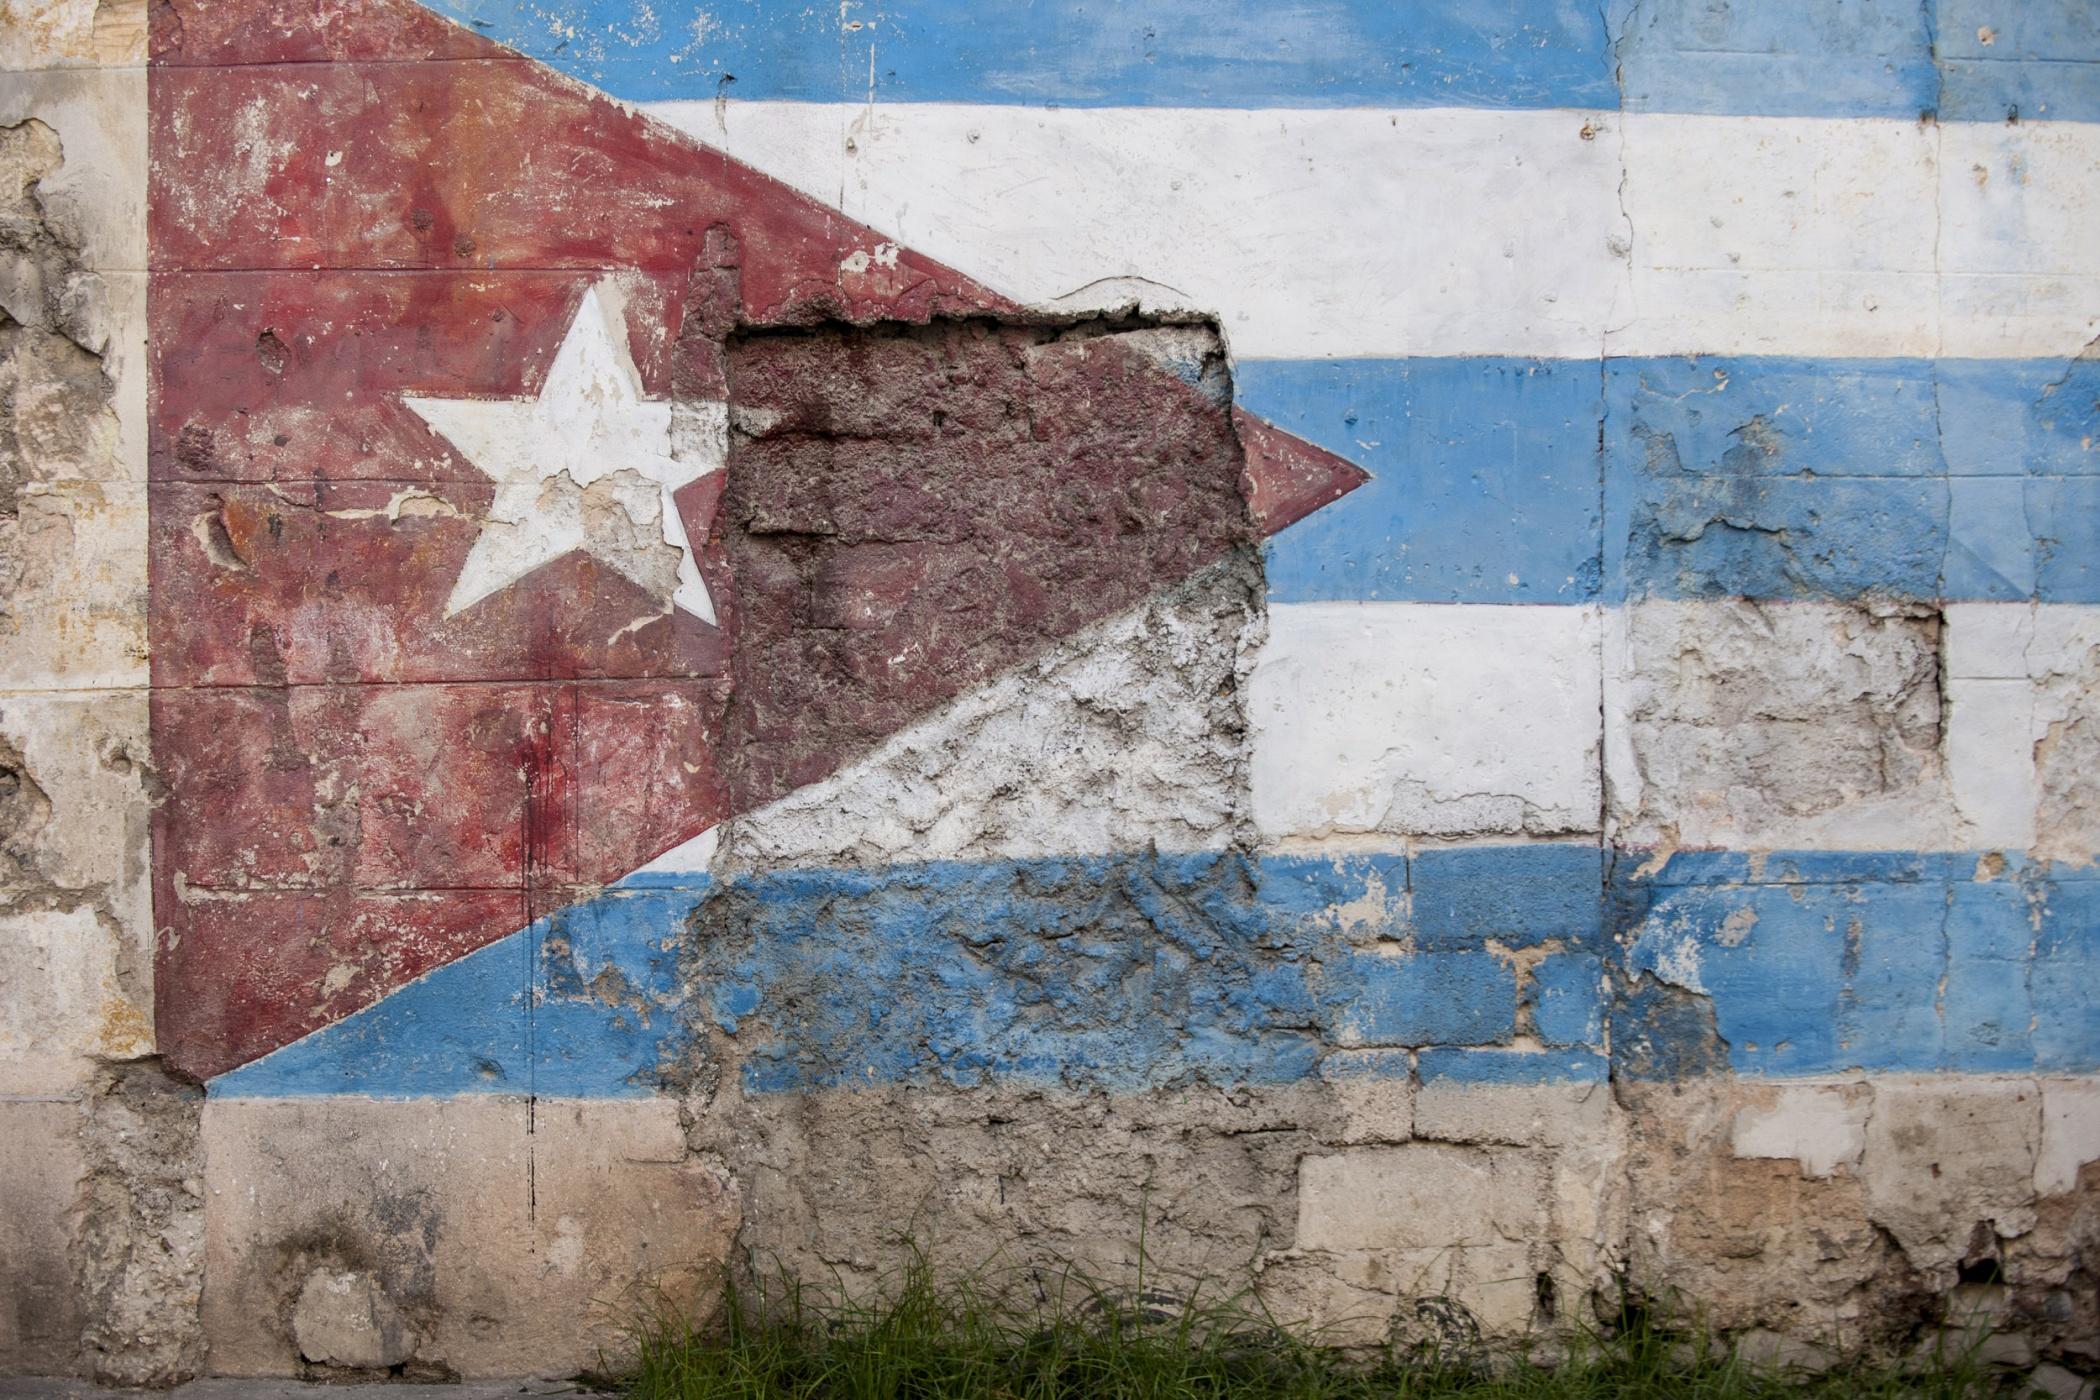 Bandera 01 - Prints 2. Ethnoland - Hector Garrido, Aerial and human photography